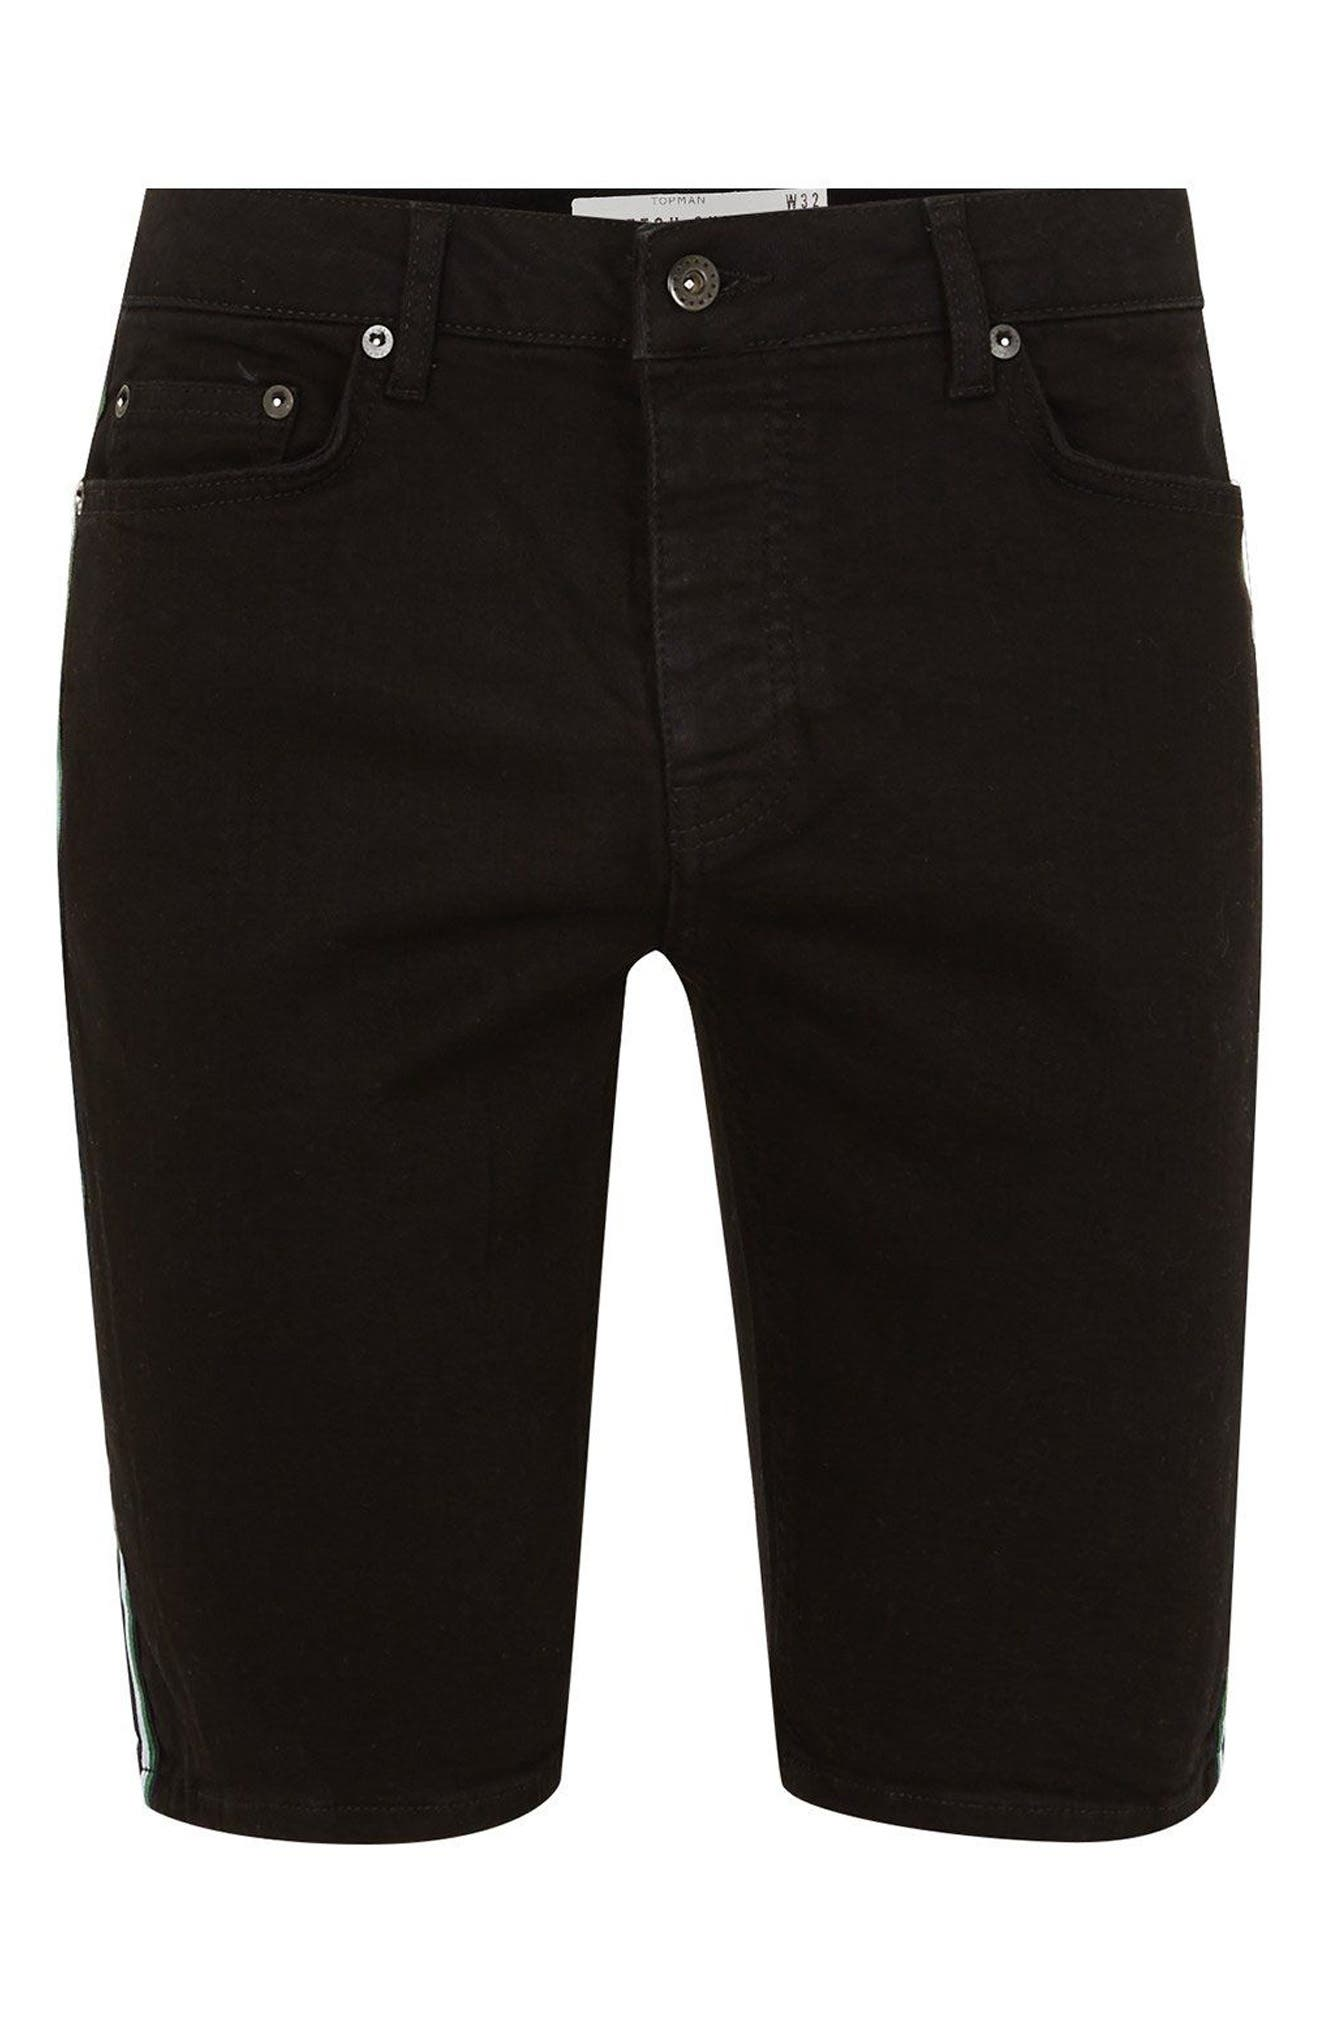 Tape Stretch Skinny Fit Denim Shorts,                             Alternate thumbnail 4, color,                             001